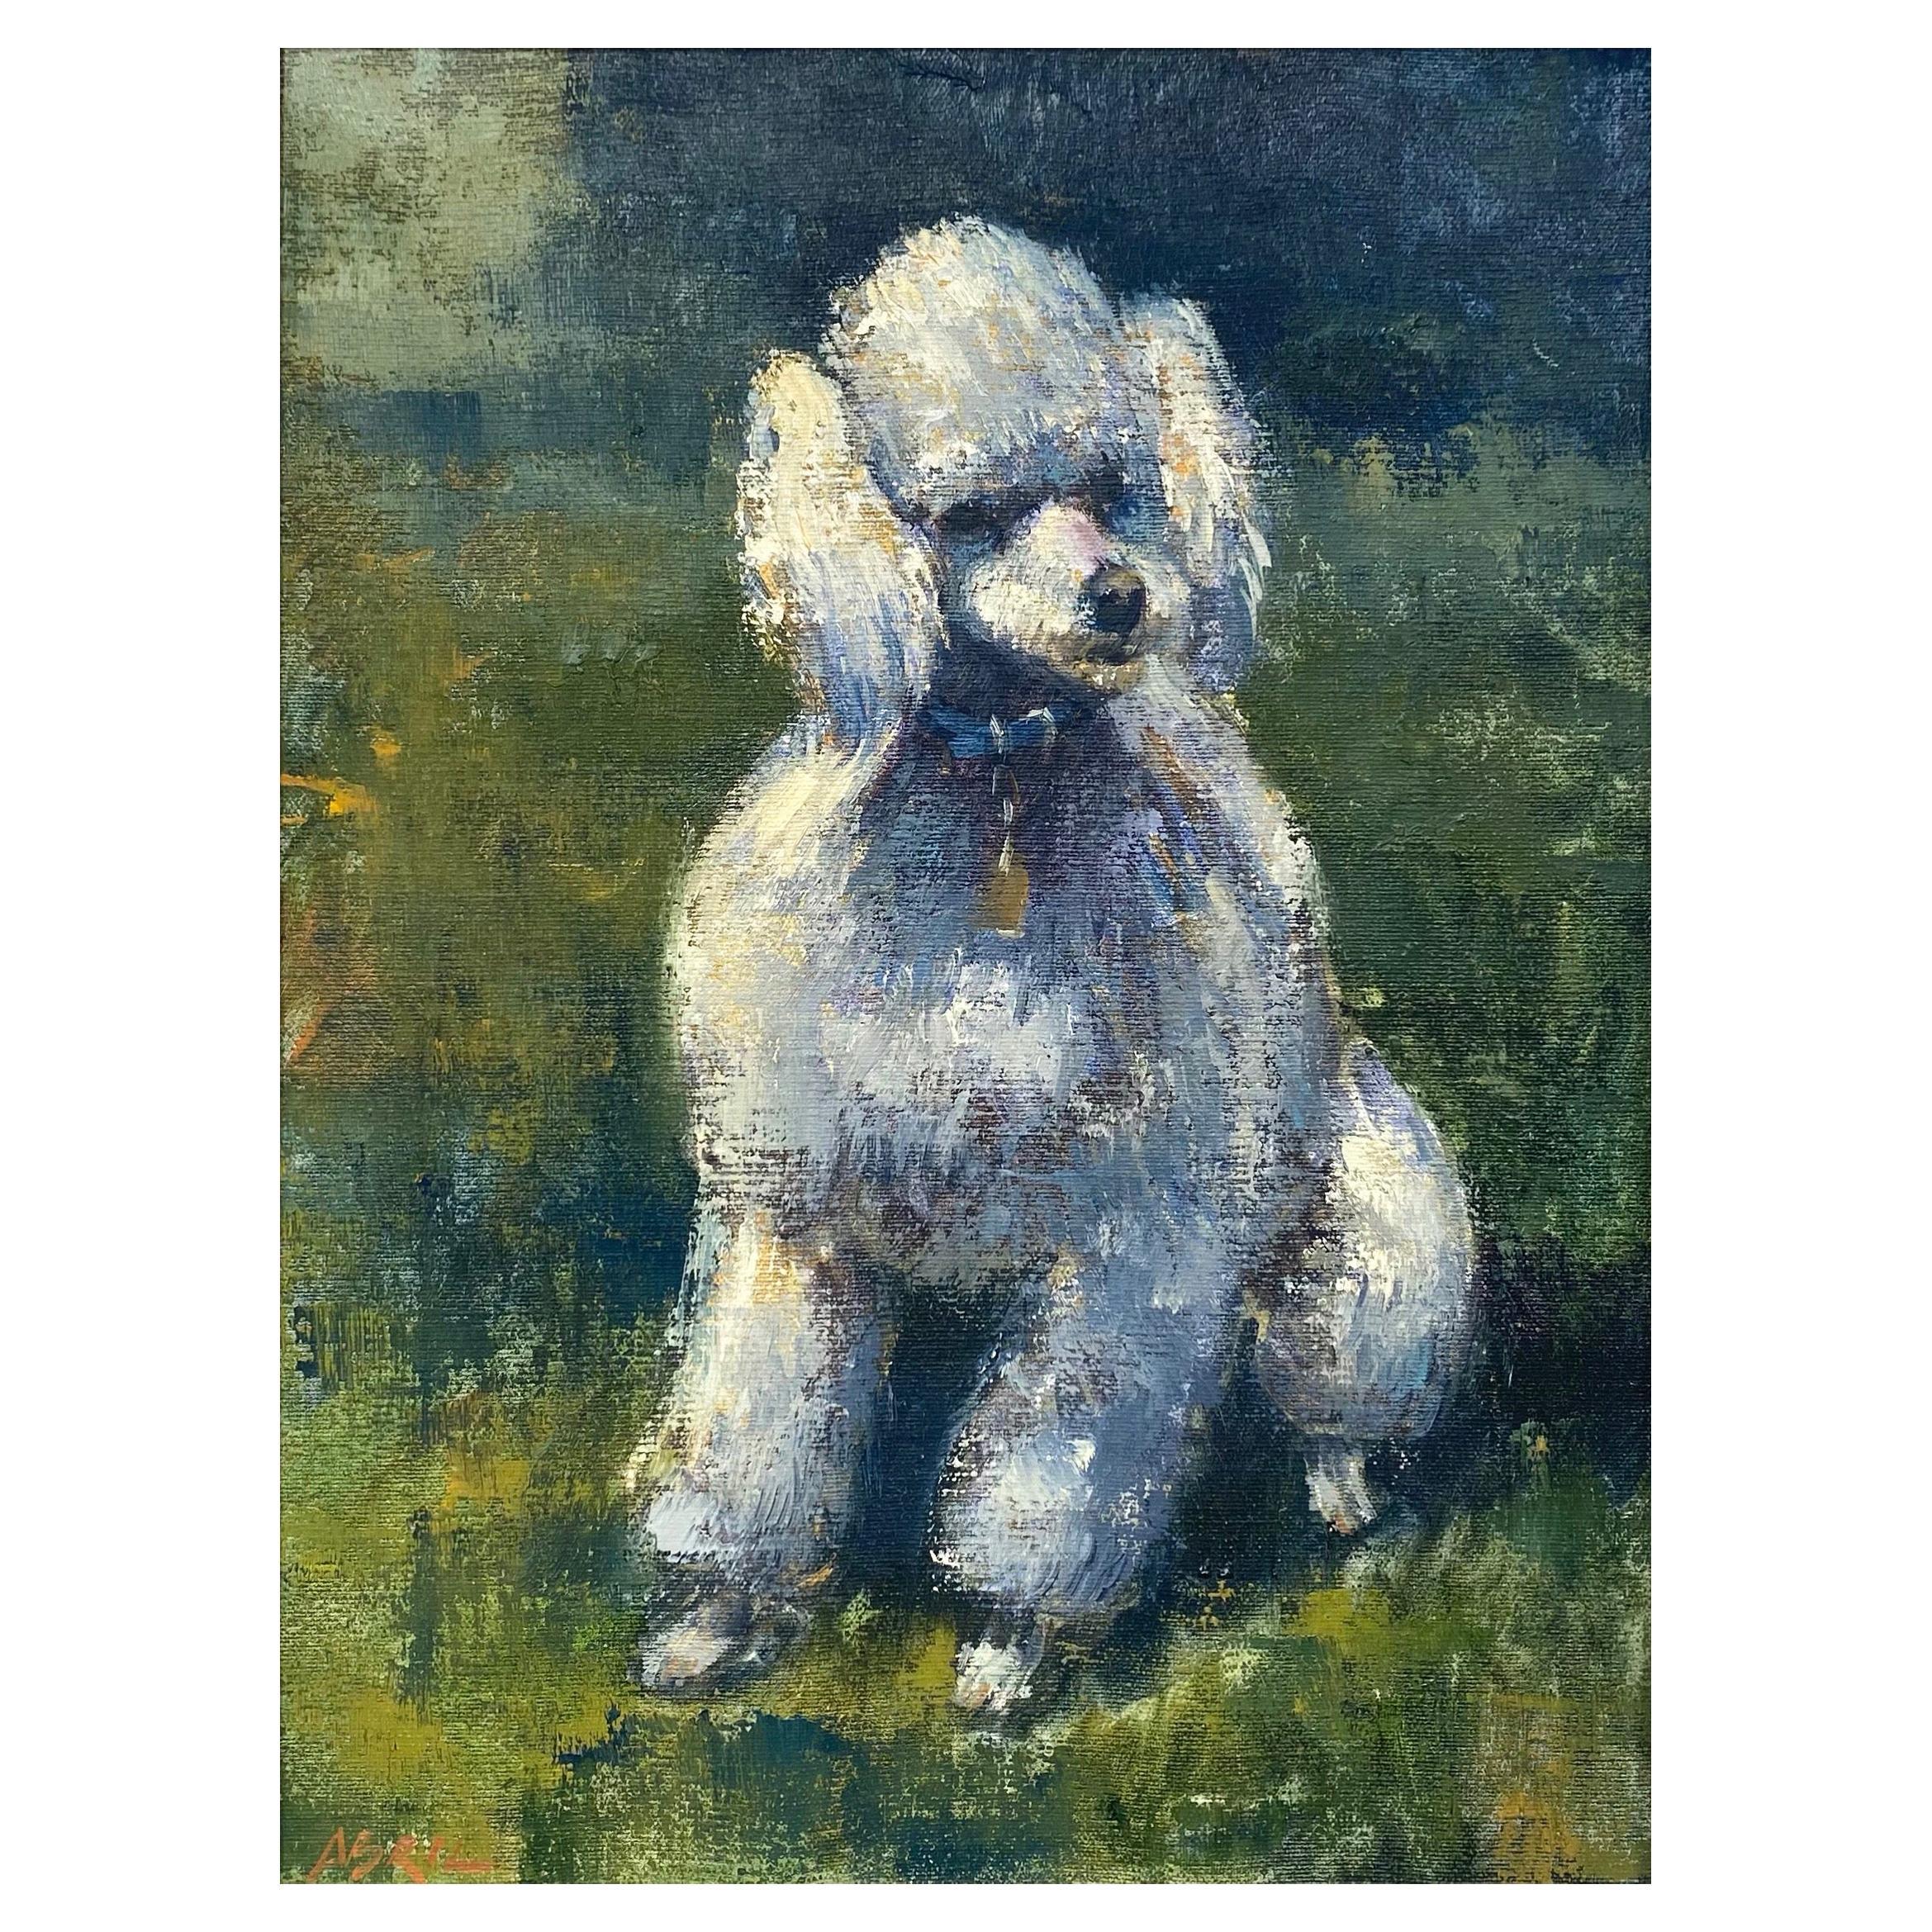 Ben Abril, Impressionist Portrait Painting of Nixon's Poodle Vicky, 1960s